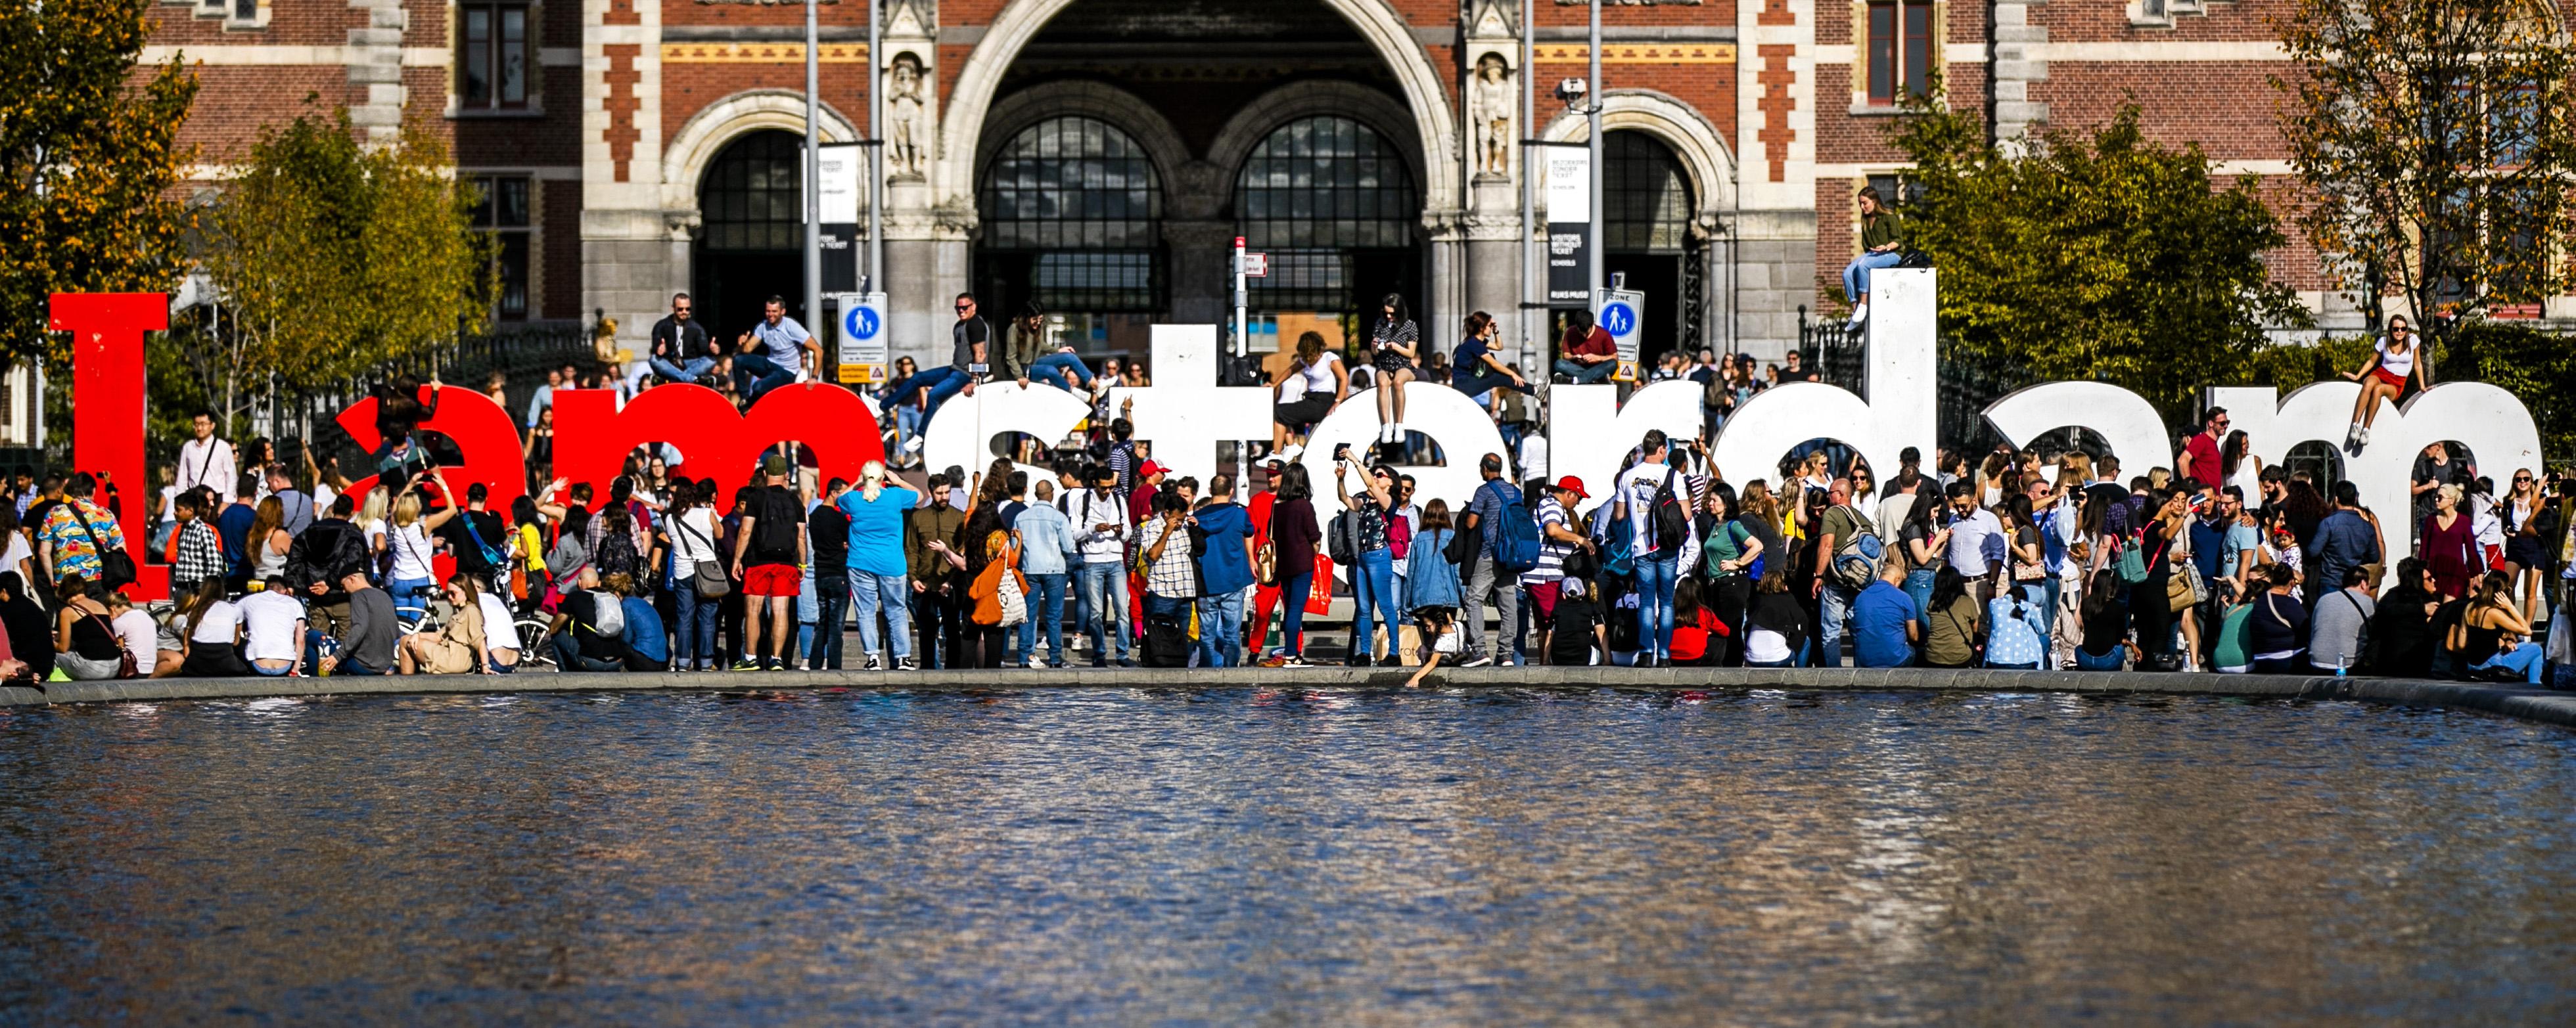 Toeristen bij I Amsterdam.